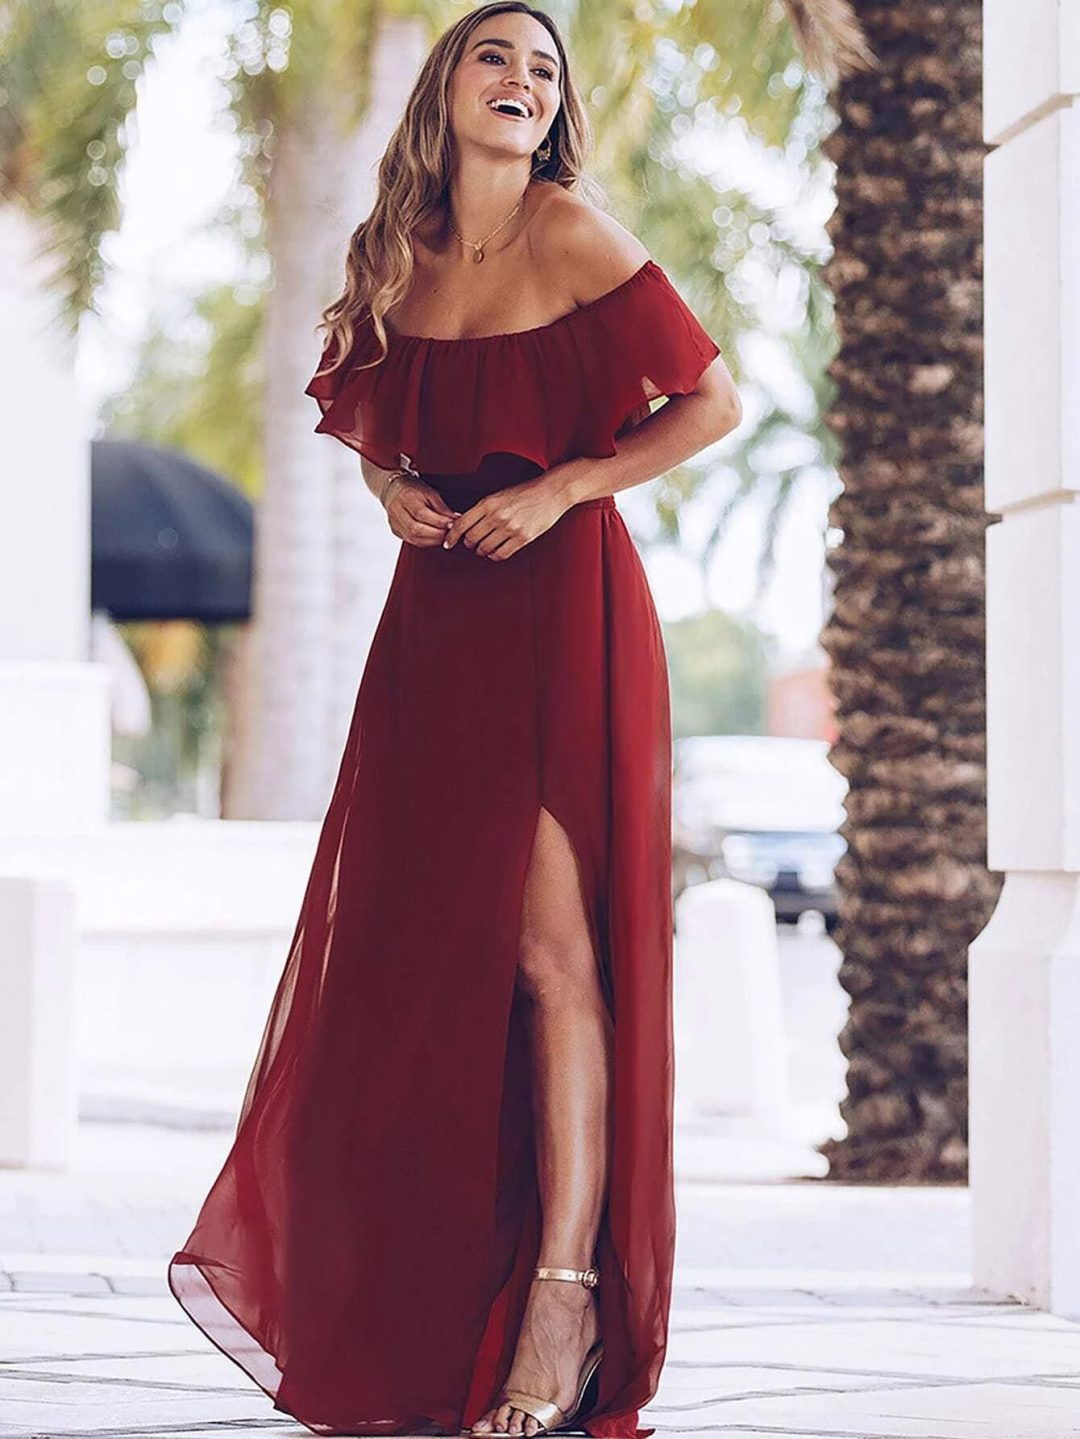 Red chiffon dress with slit and ruffles